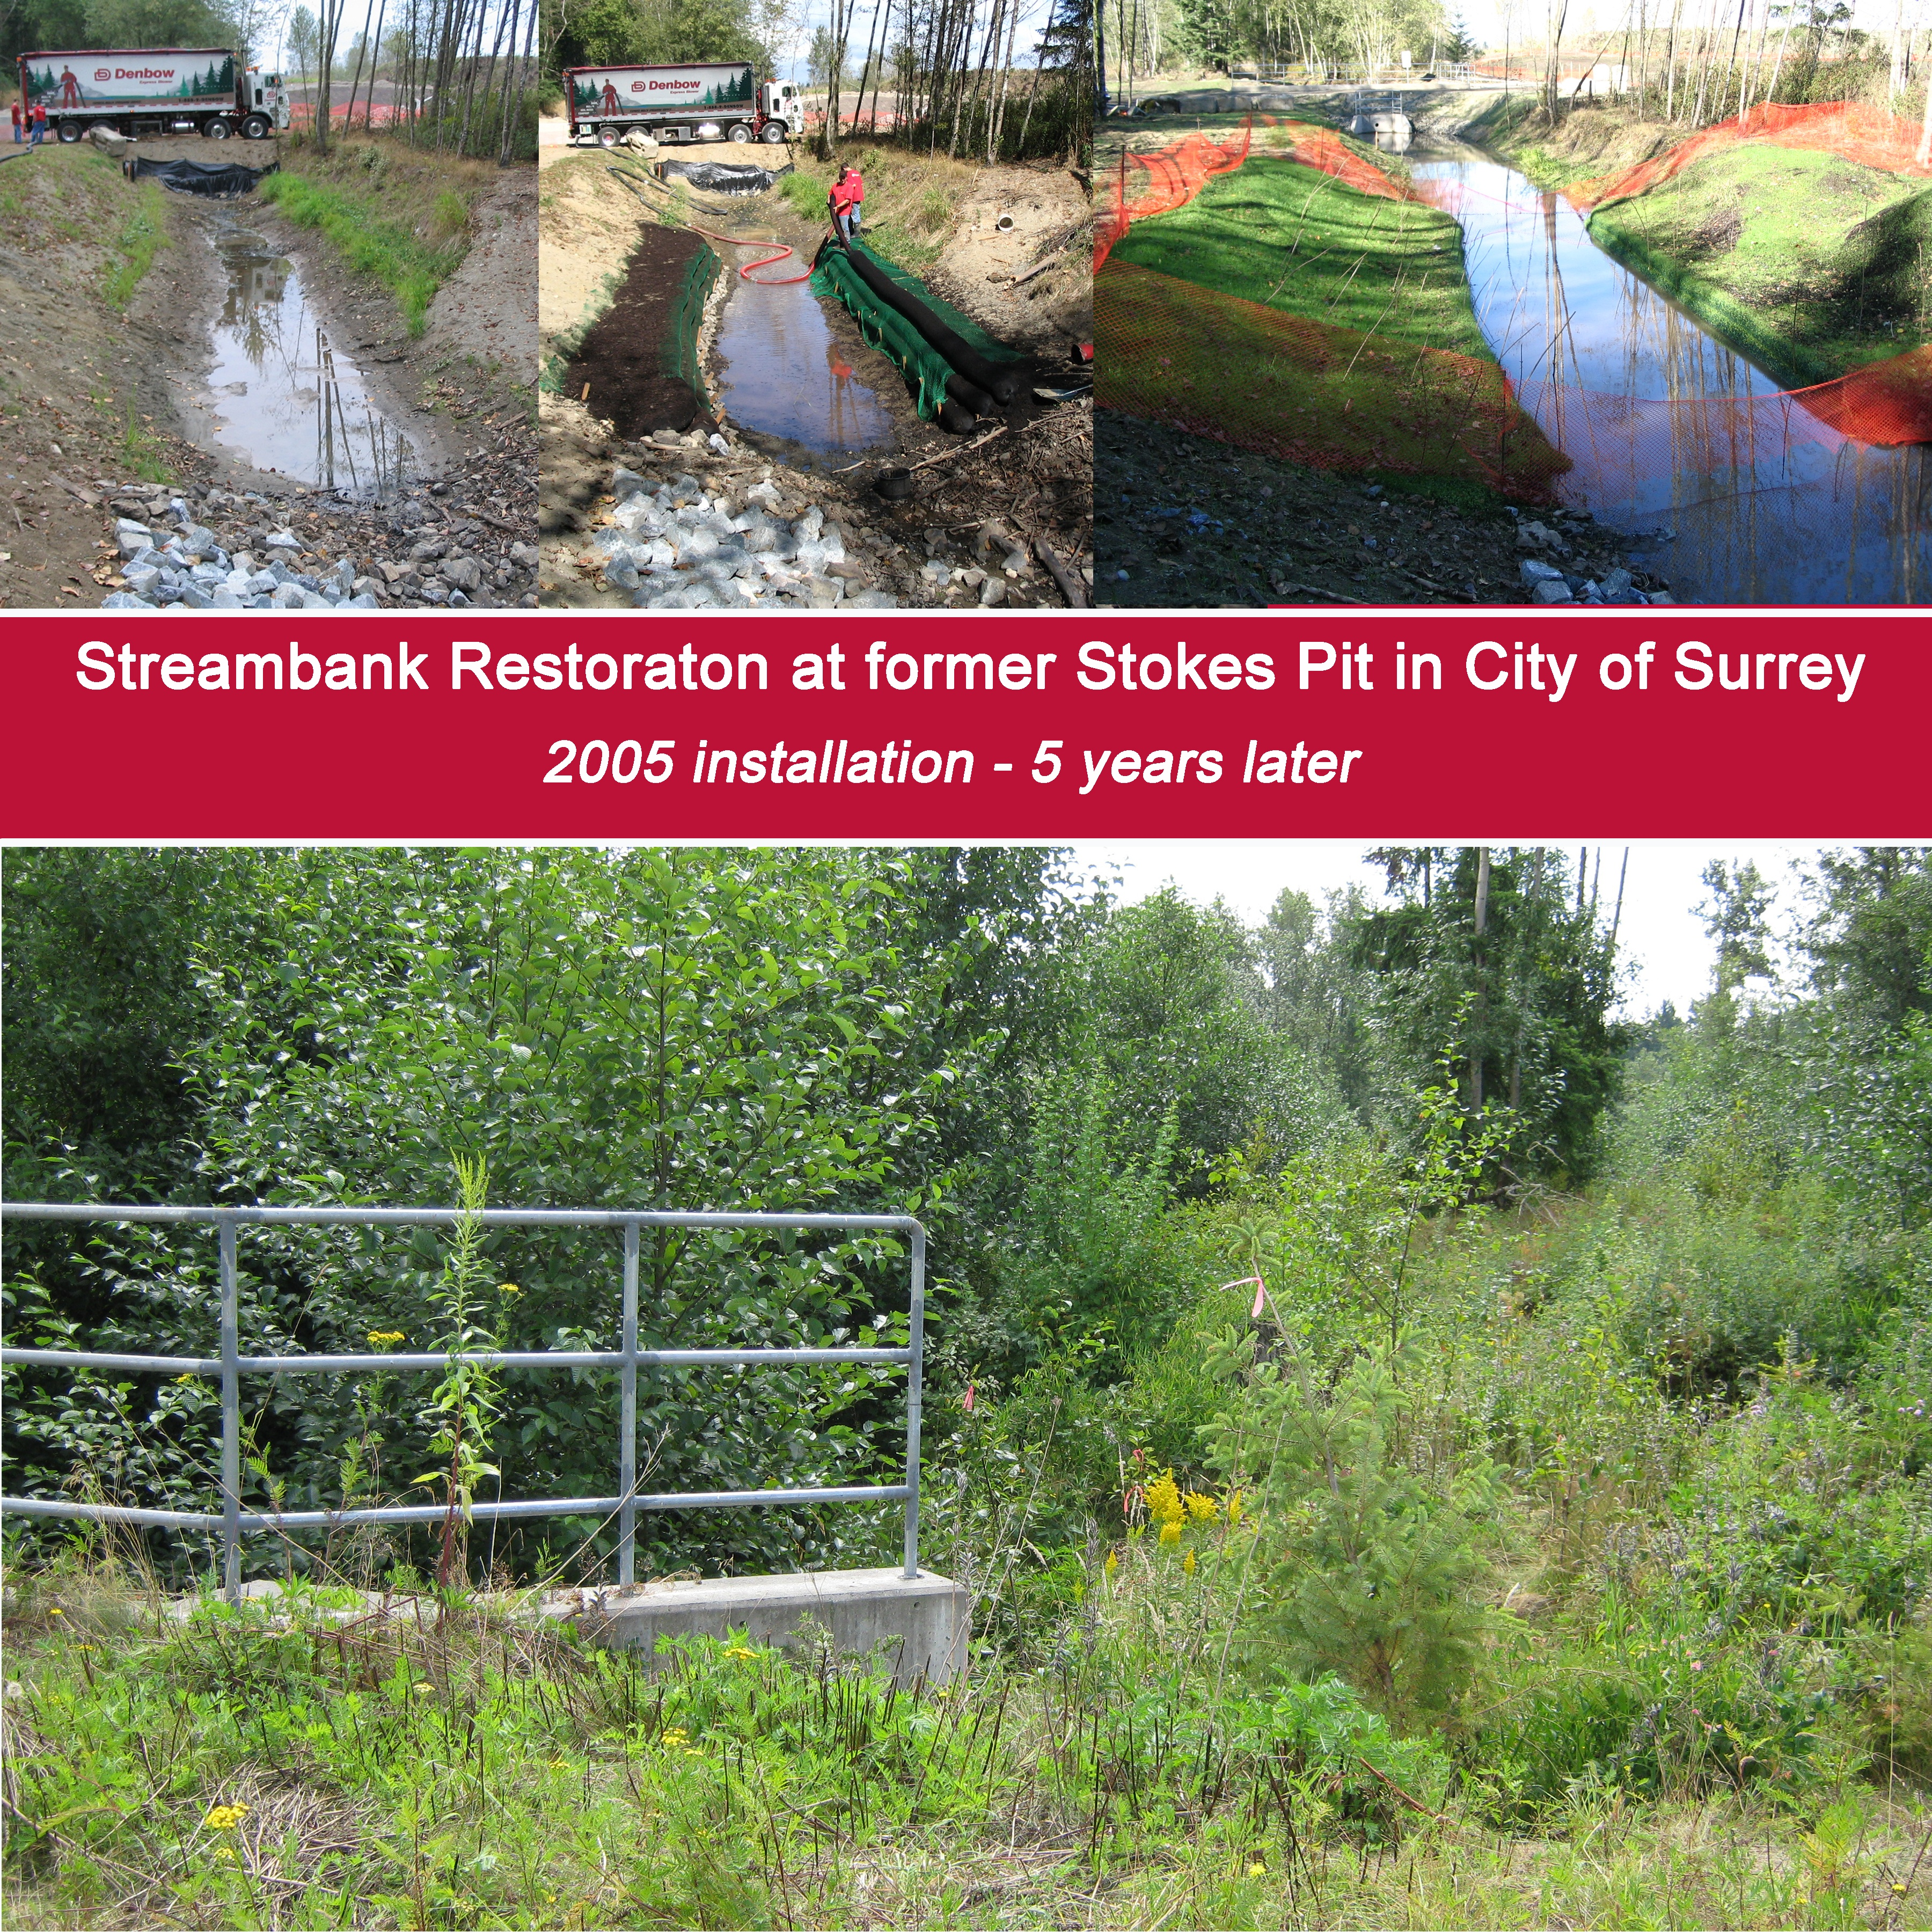 Streambank Restoration - Stokes Pit Surrey, BC 5 years